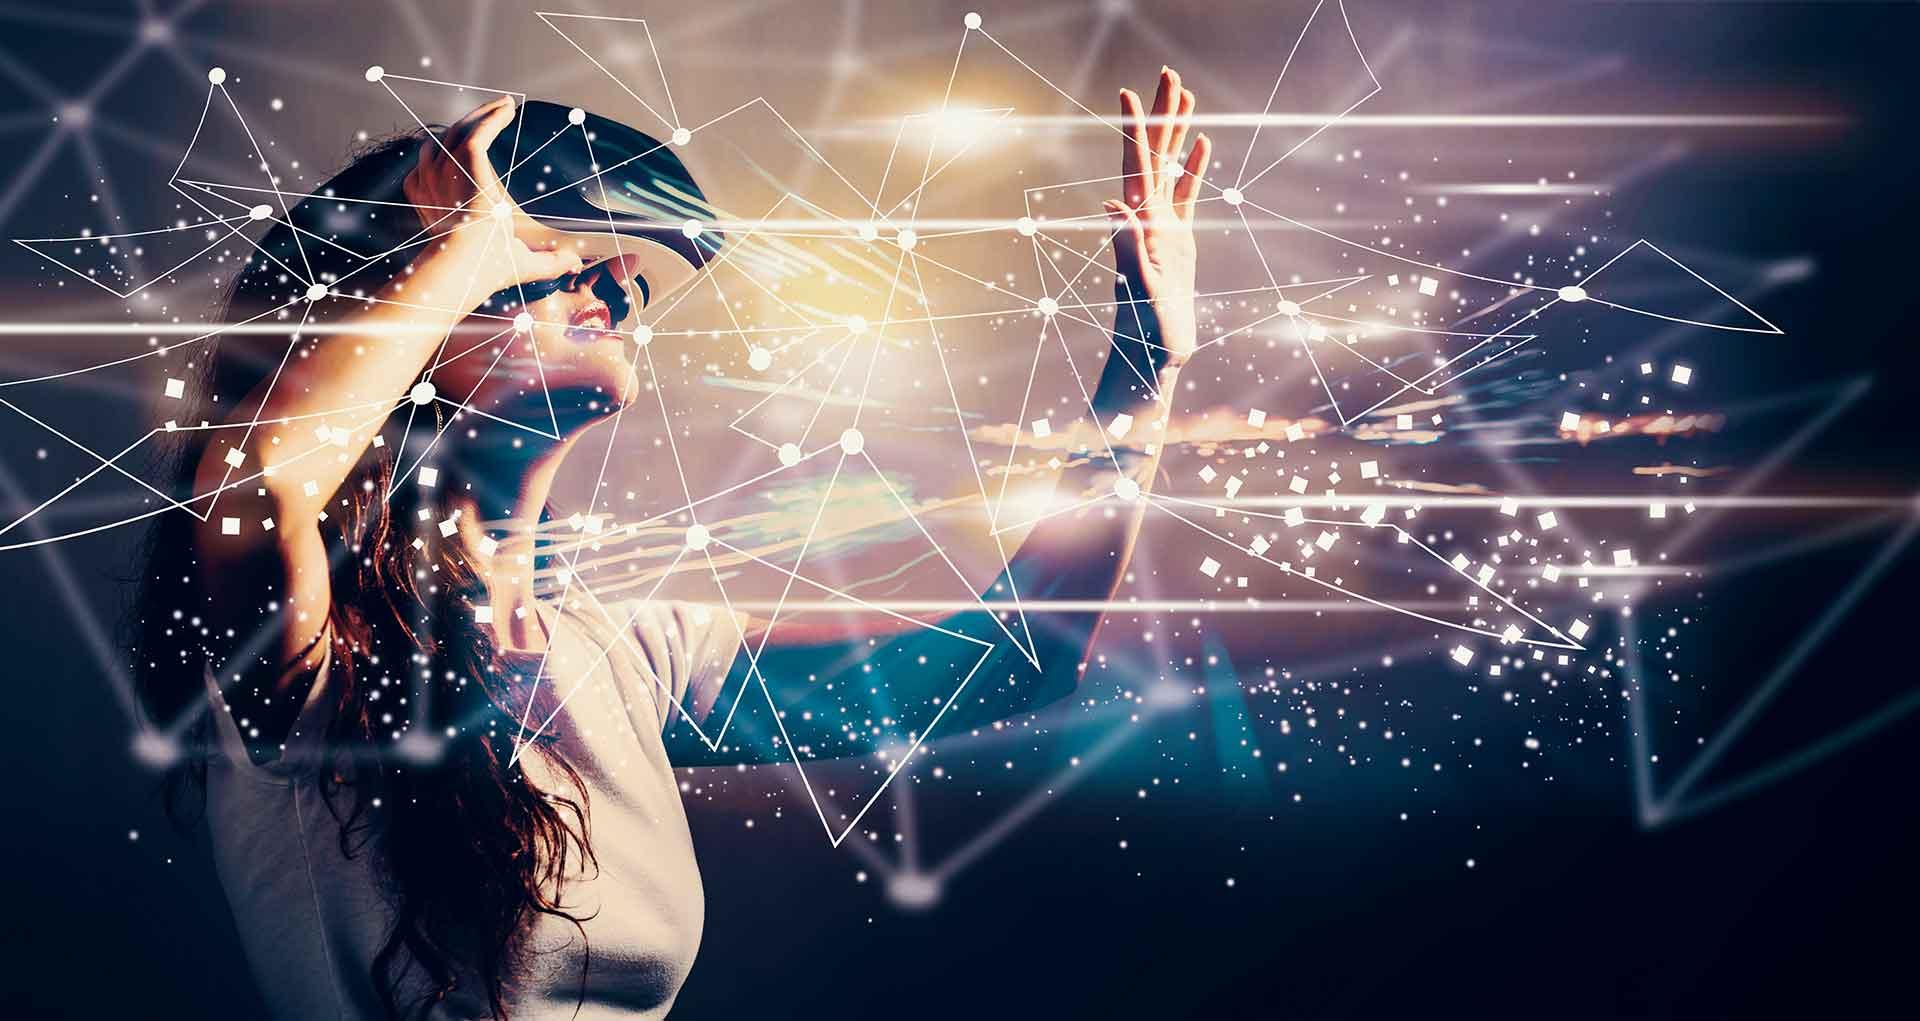 Inspark realidad virtual